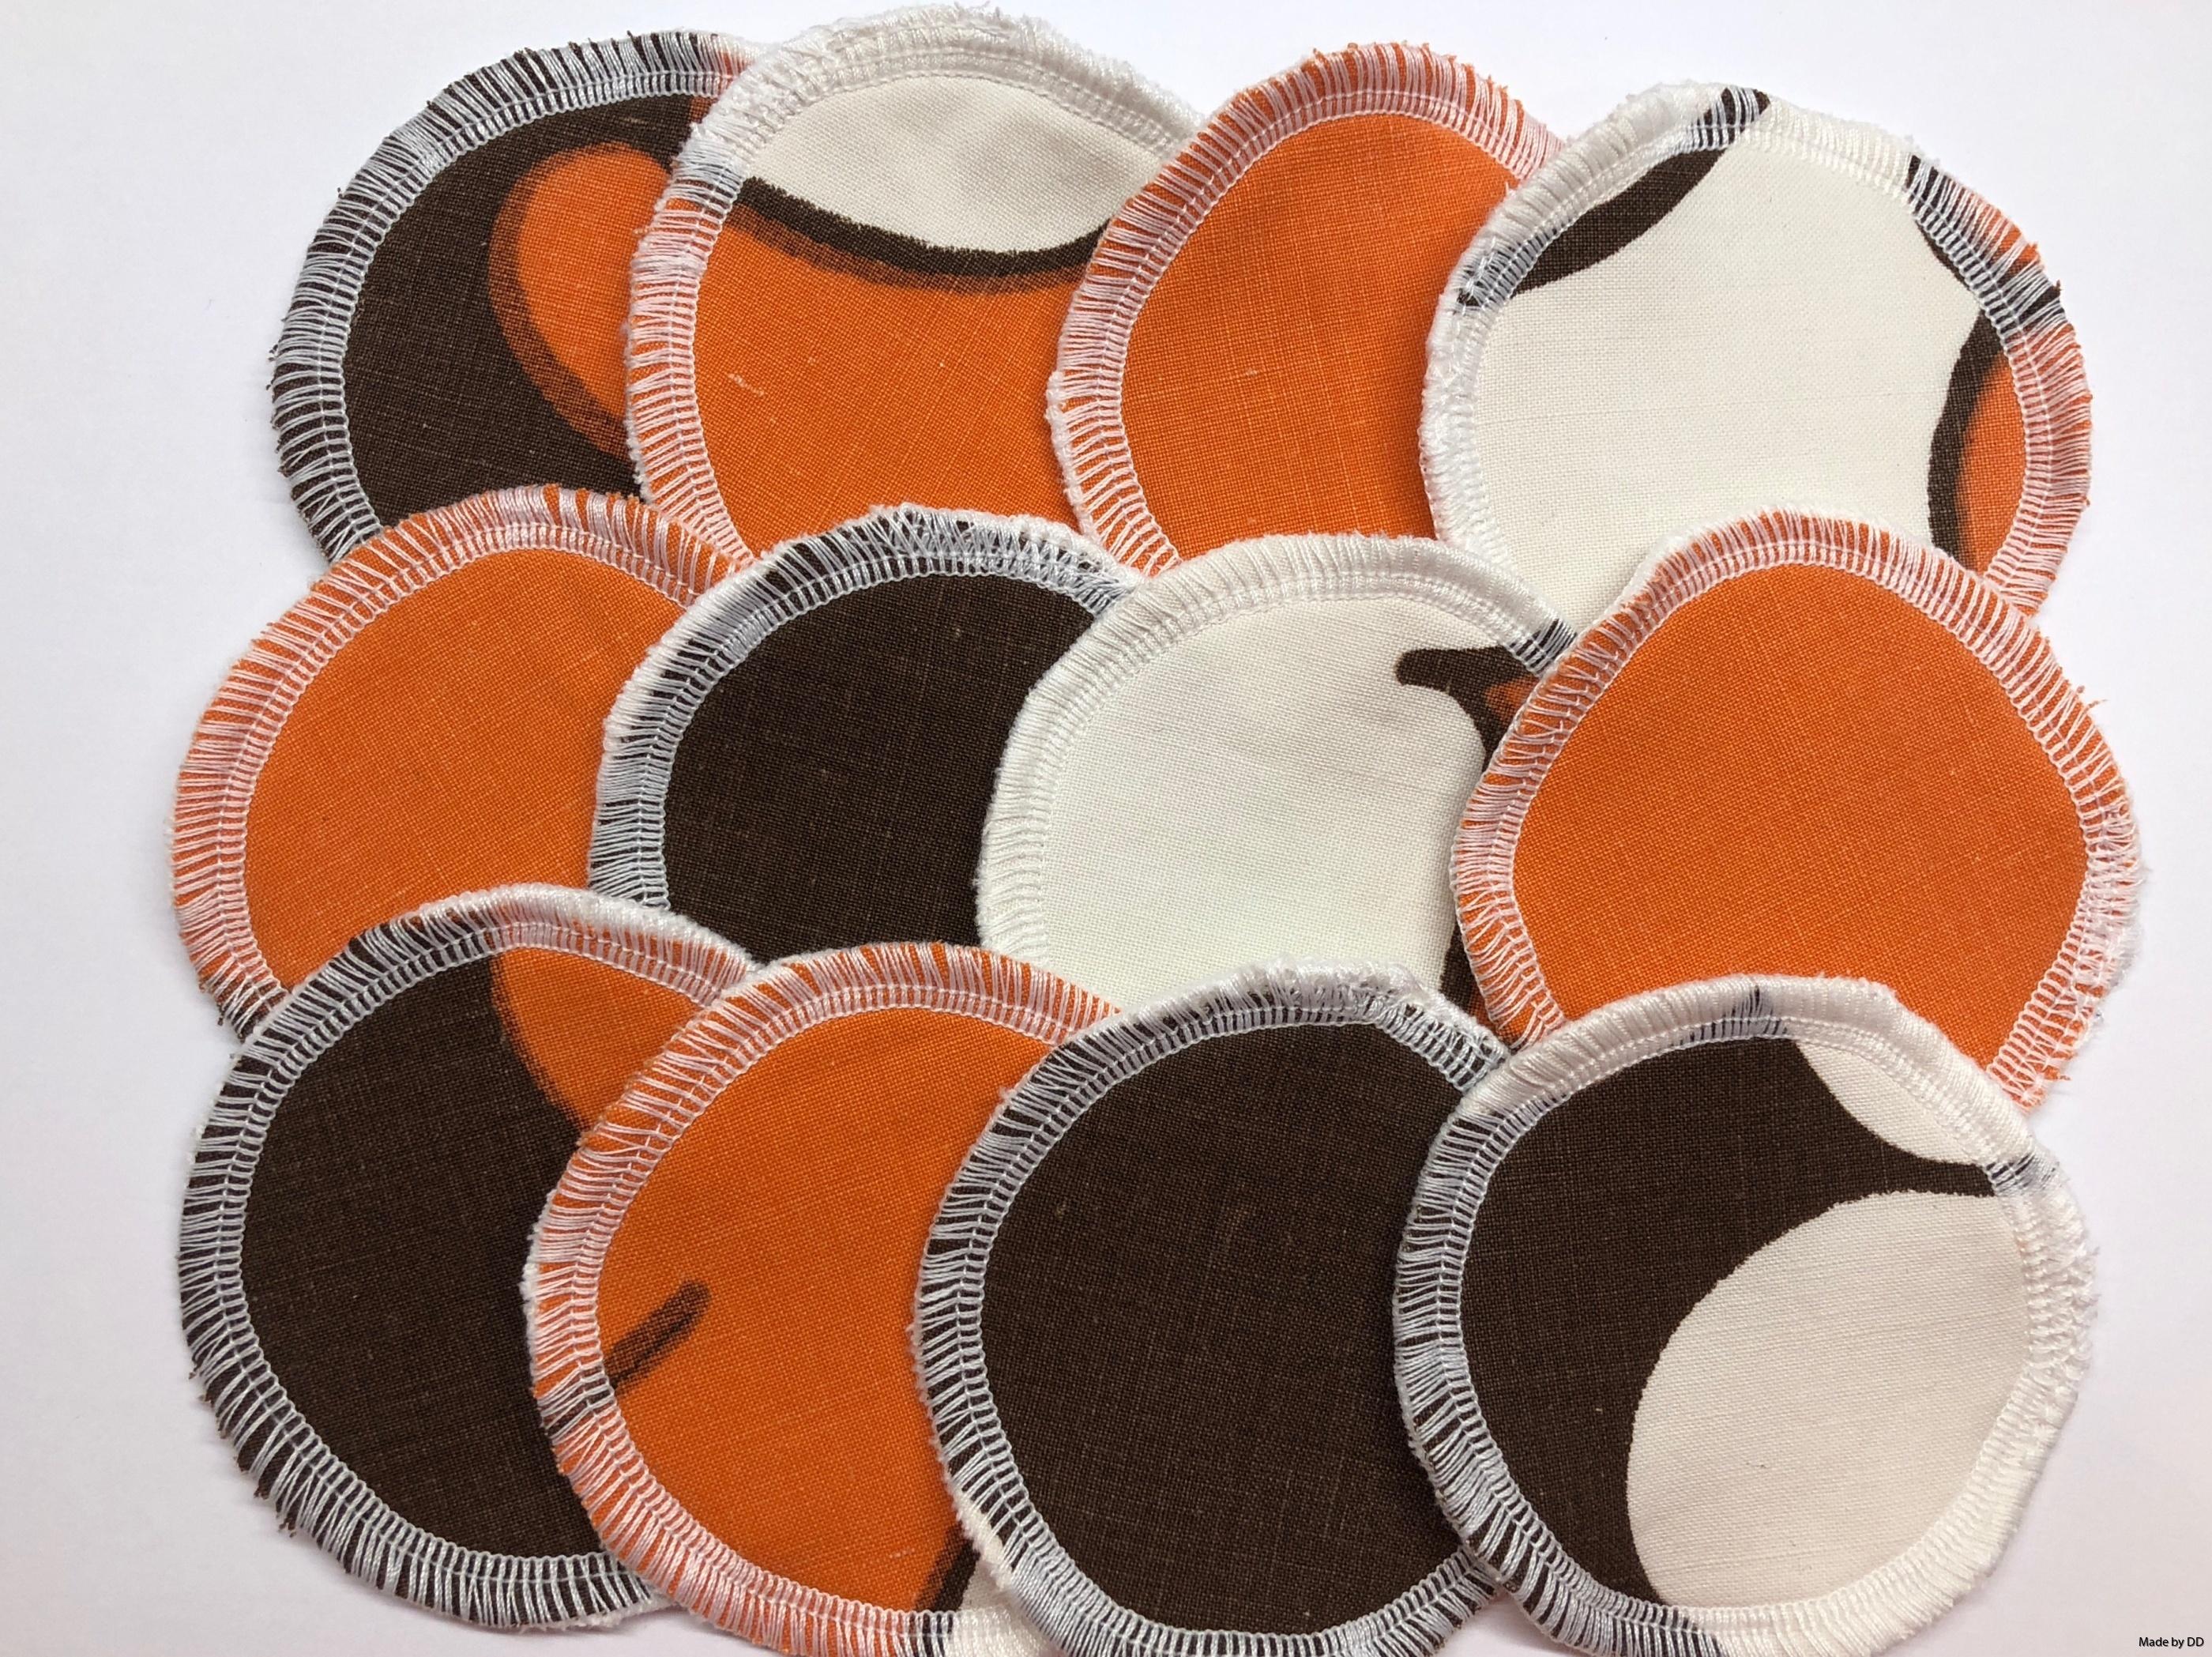 Rengöringspads rengöringsrondeller bomullsrondeller återbruk sjuttiontalstyg bomullsvelour ekologiskt GOTS made by dd orange brun